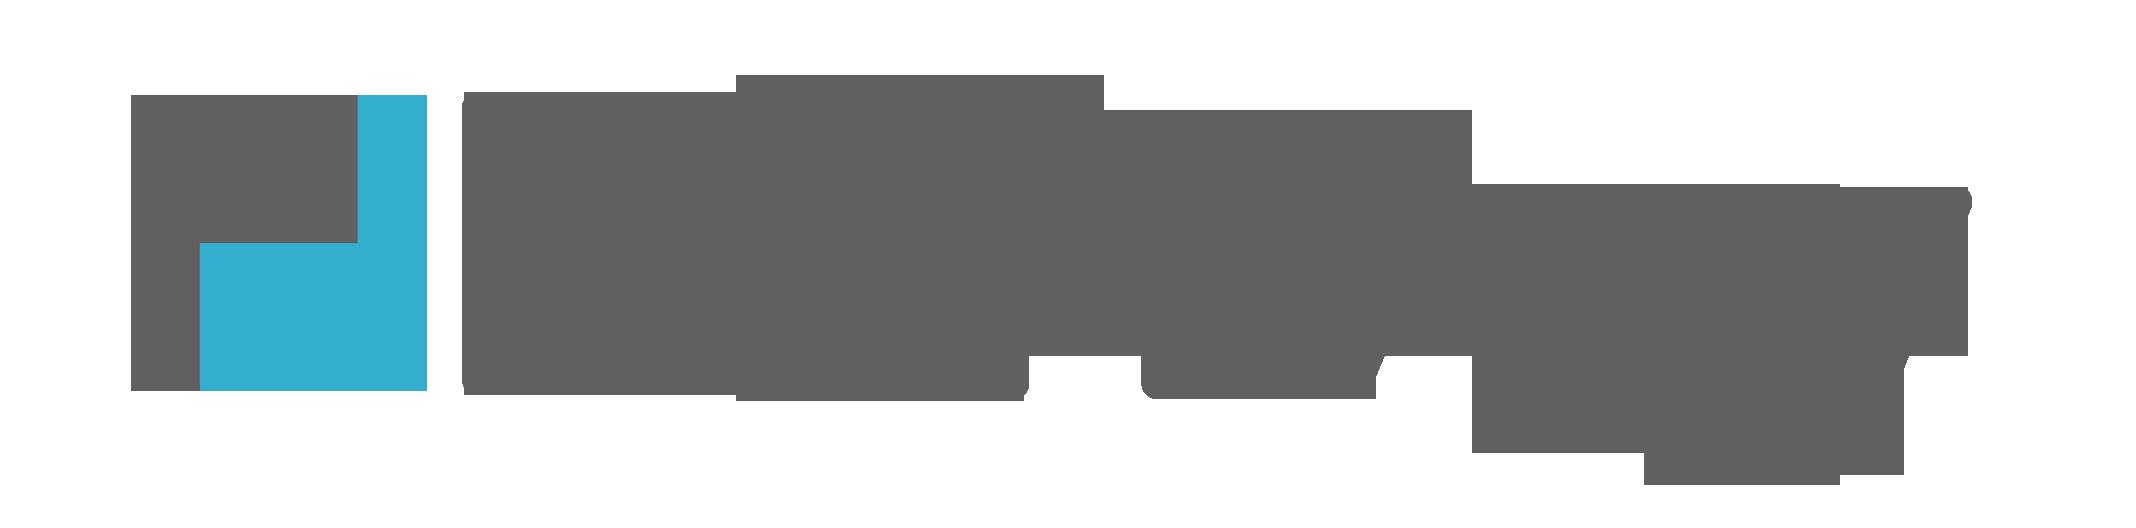 Square1 integrates with Delhivery